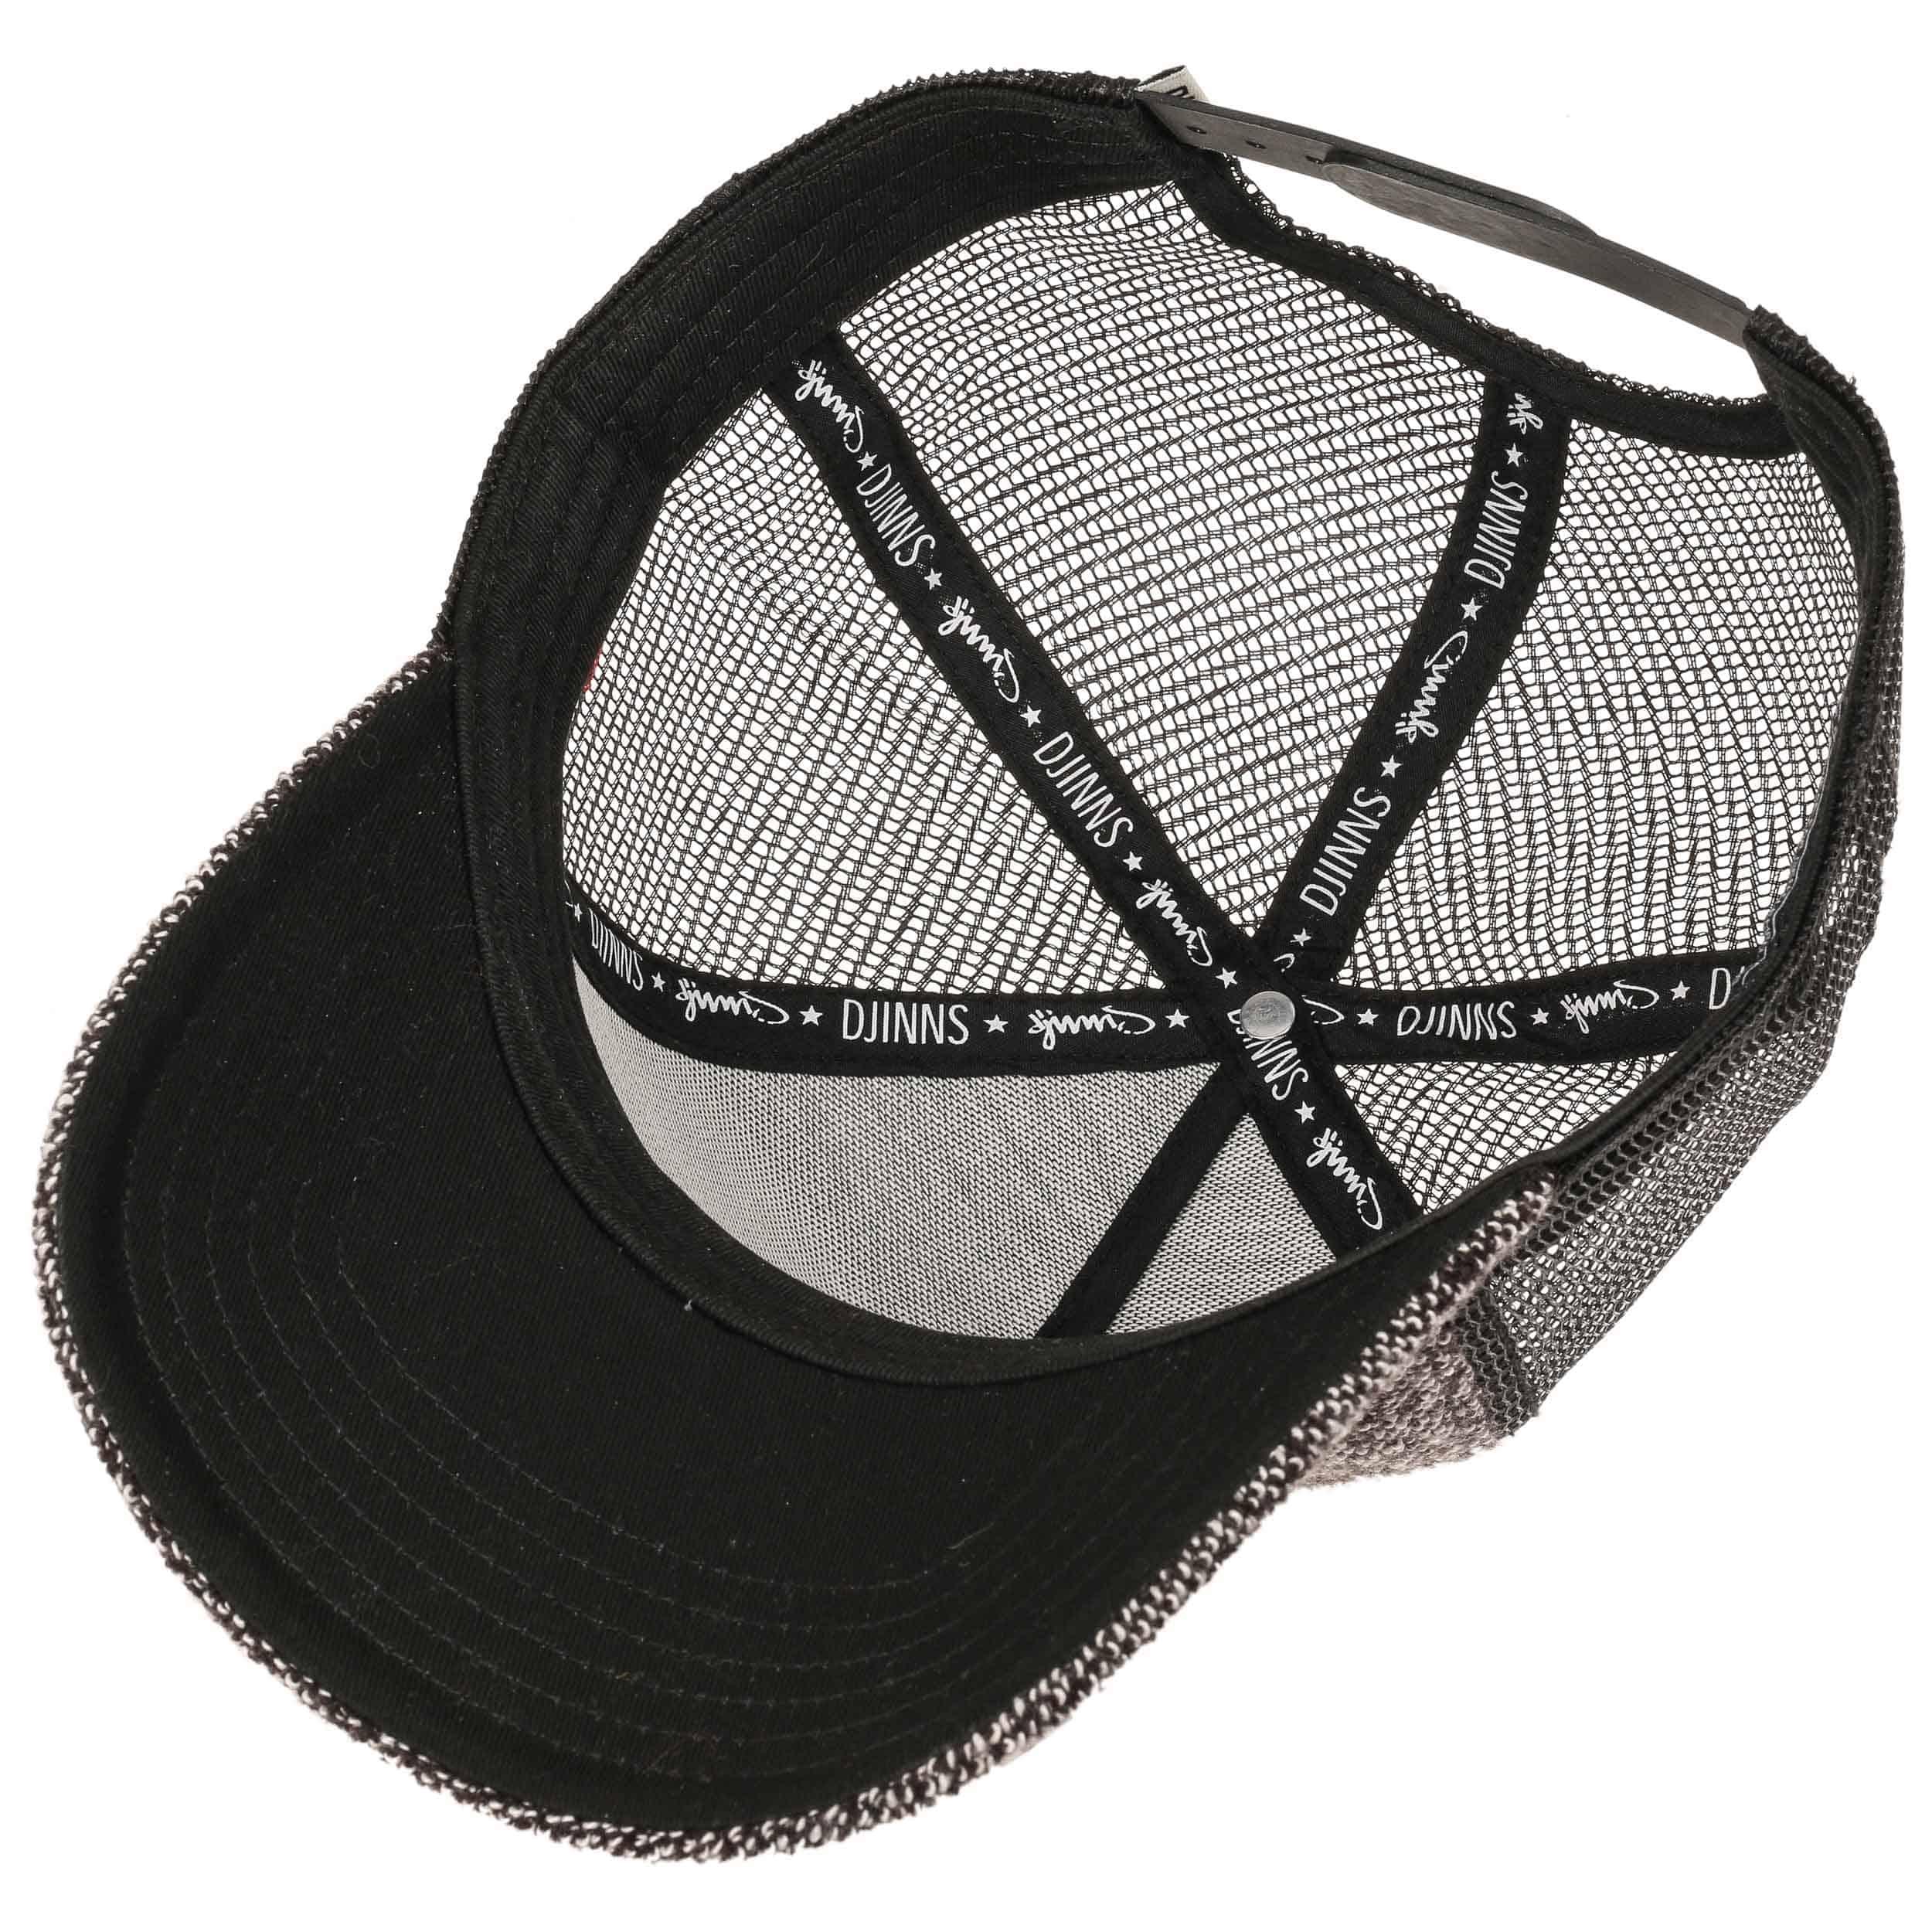 rip jersey hft trucker cap by djinns gbp 19 95 hats. Black Bedroom Furniture Sets. Home Design Ideas